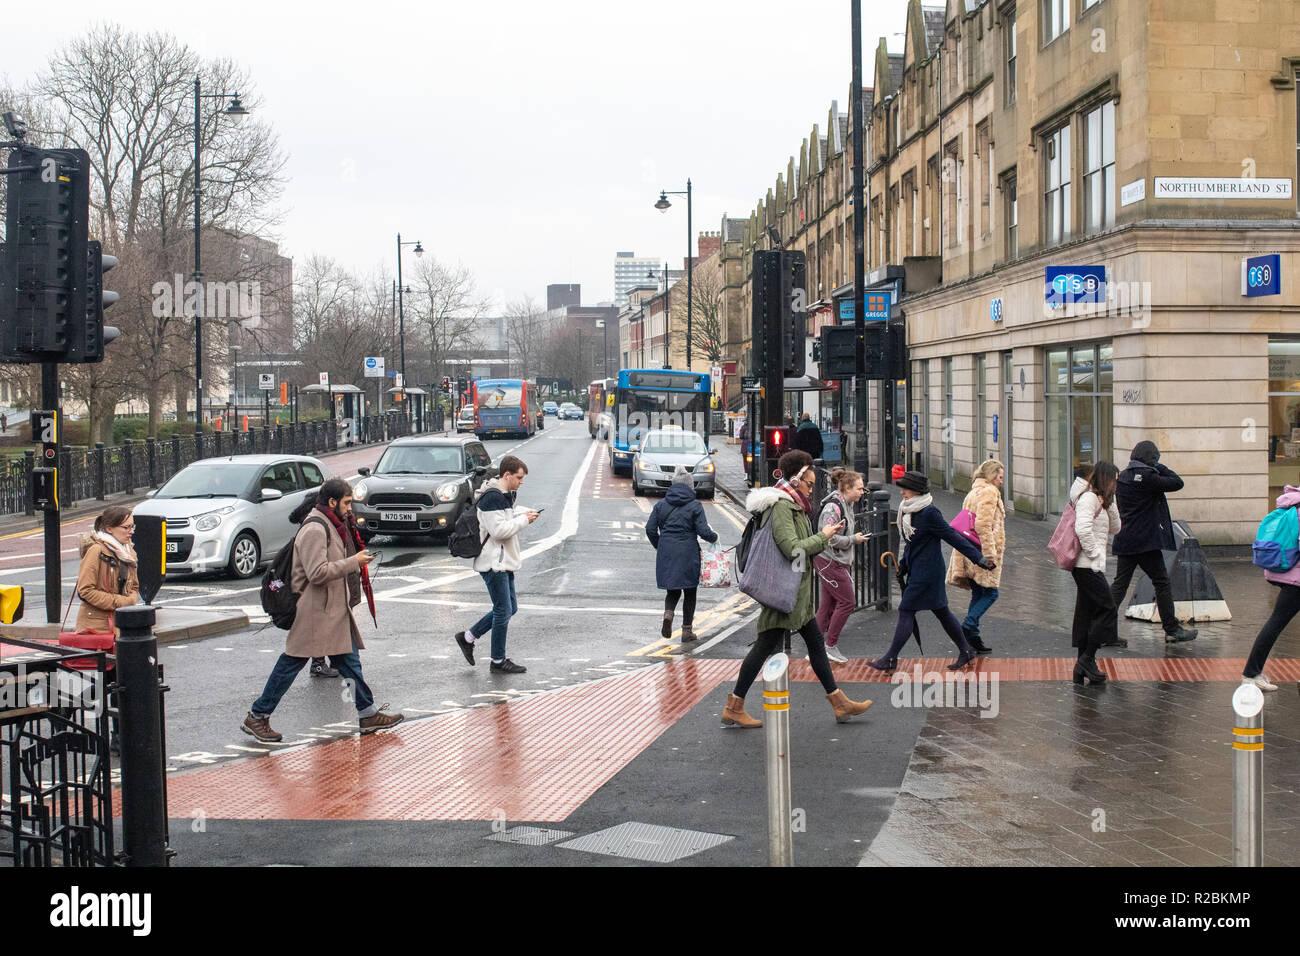 Newcastle upon Tyne/England - January 10th 2018: Newcastle people walking across busy street on mobile phones - Stock Image